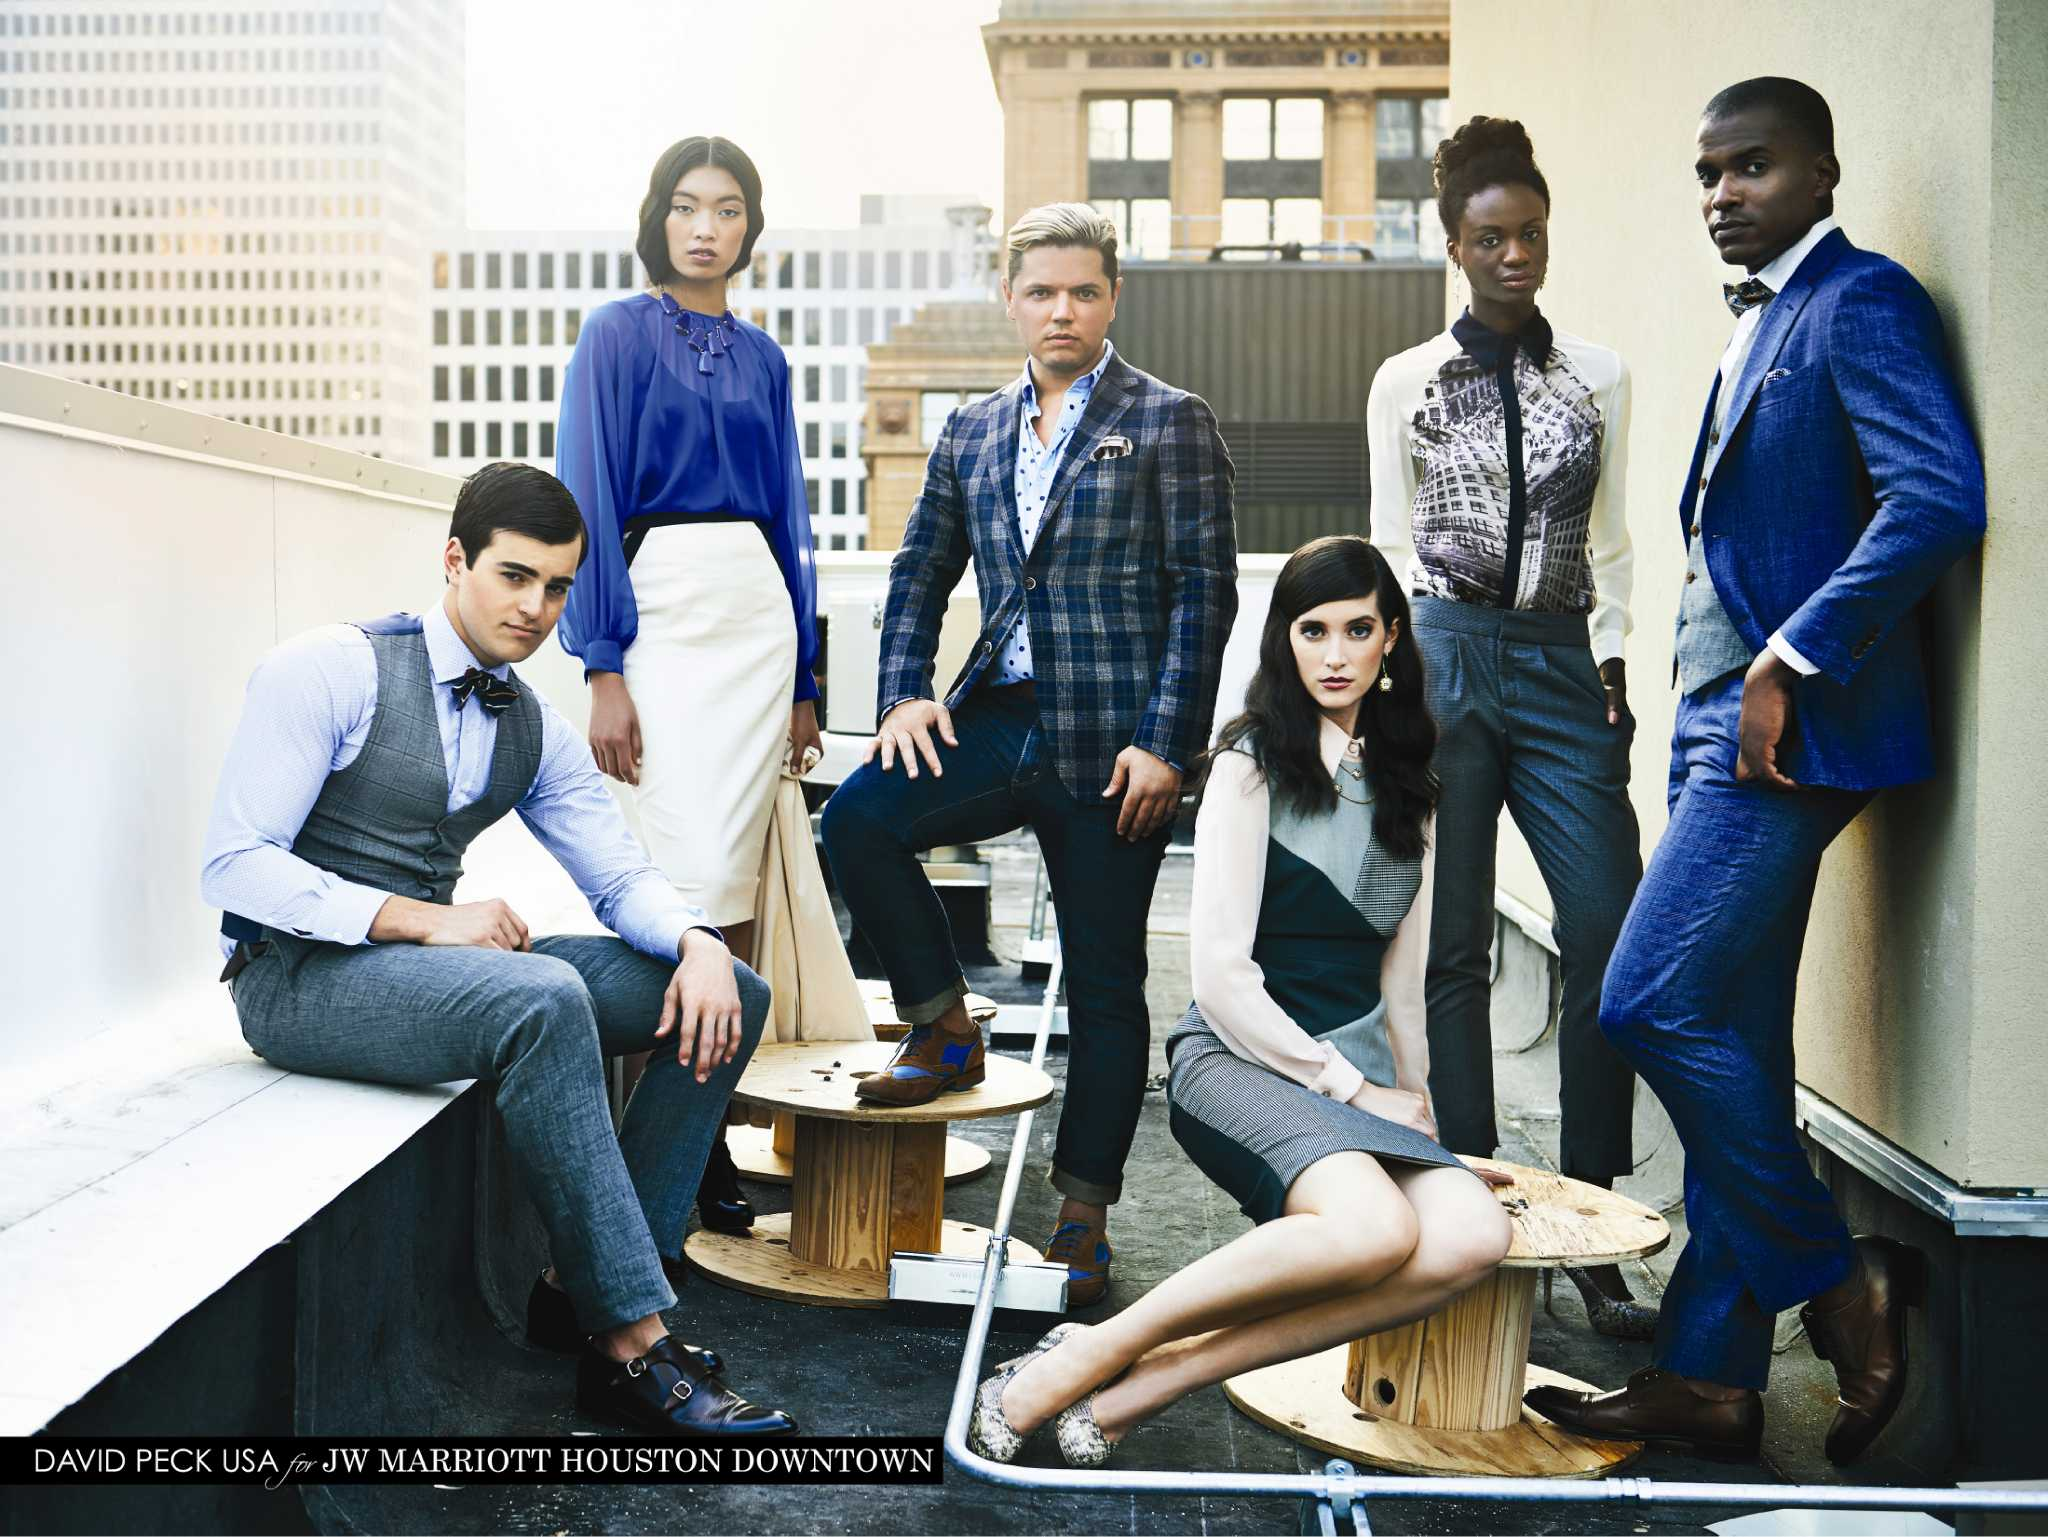 Designer Upgrades Uniform Style For Jw Marriott Downtown